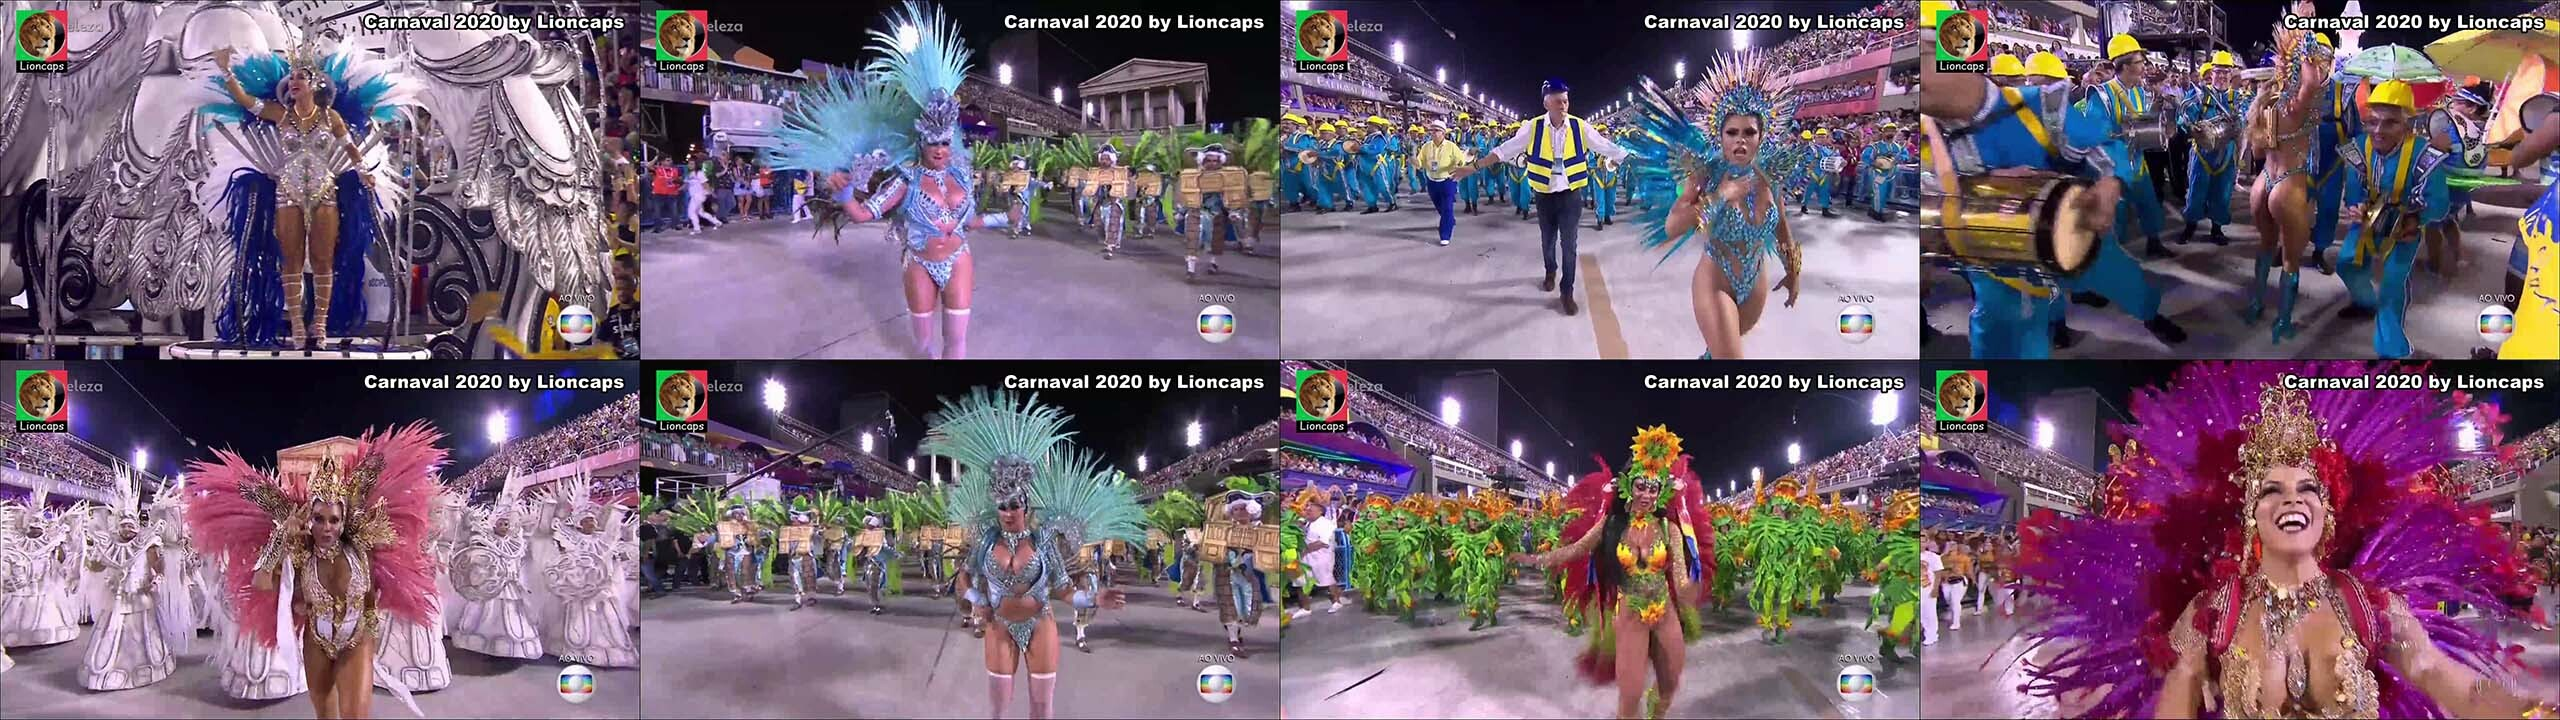 carnaval2020_lioncaps_26_03_2020_05.jpg